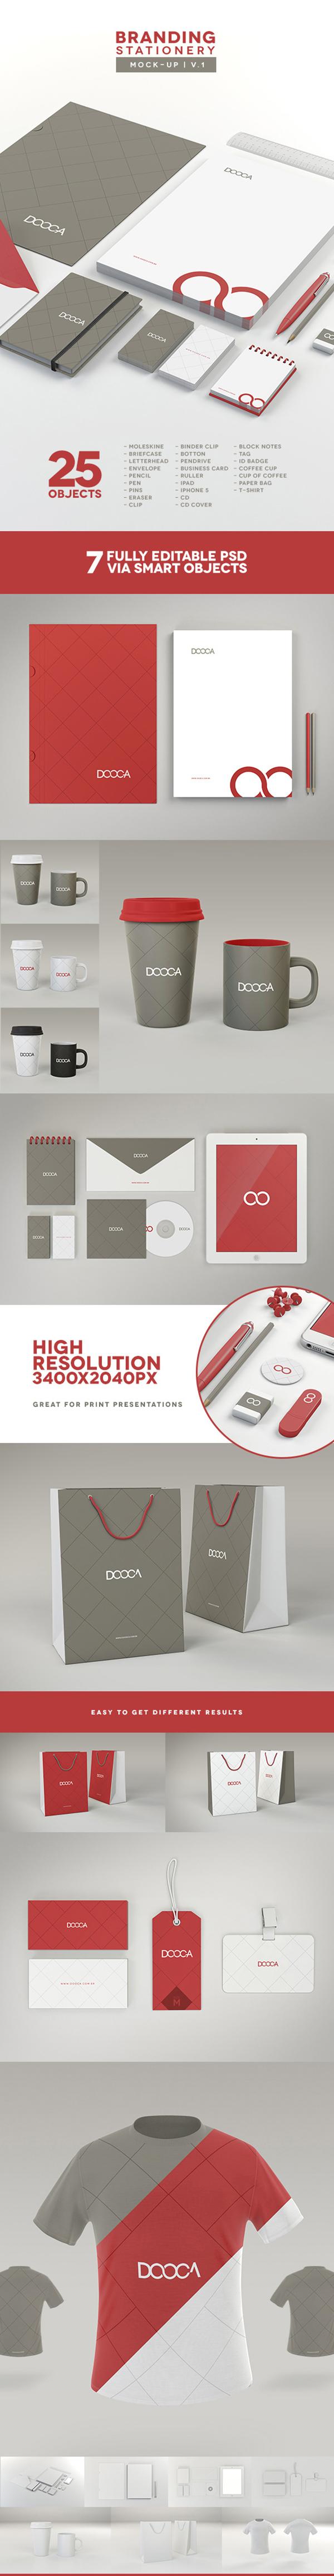 08 Branding : Stationery Mock-up